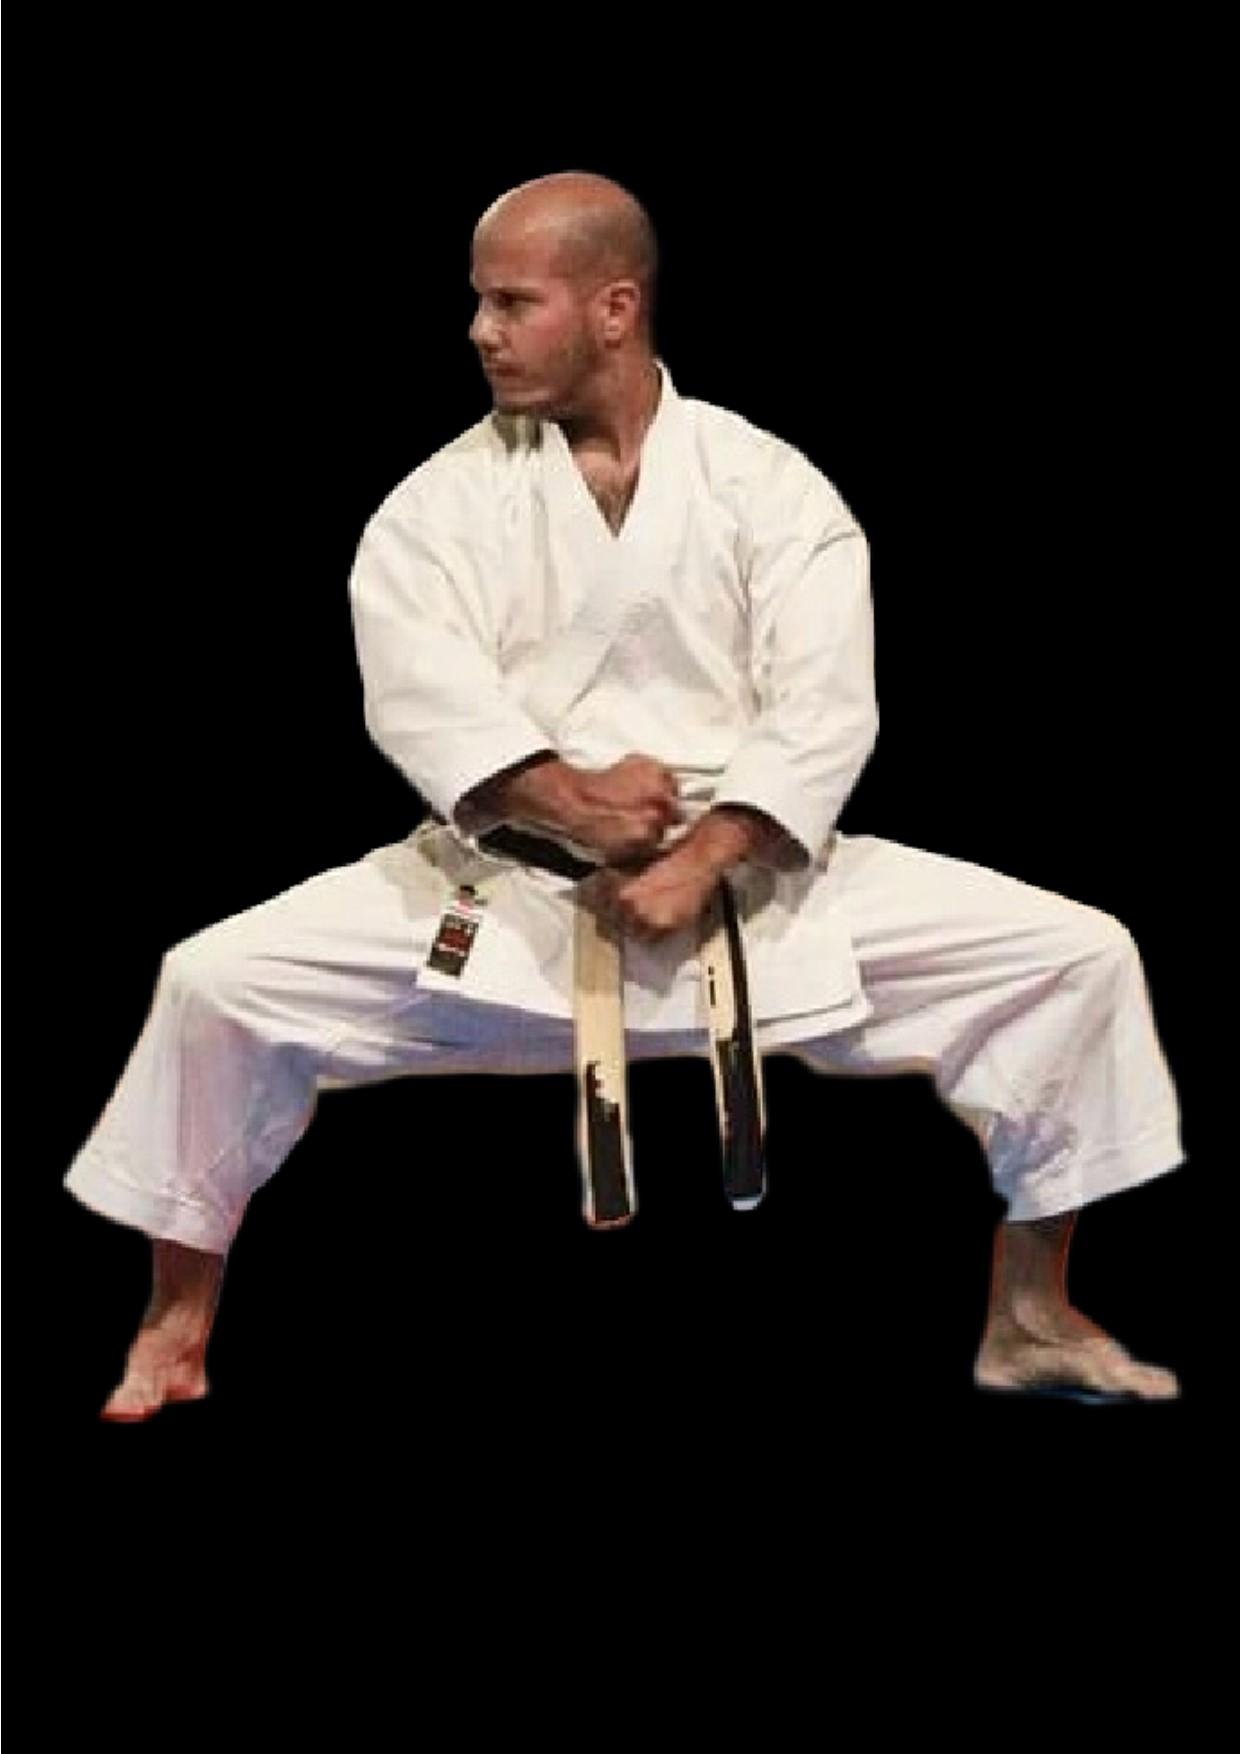 association fran aise de karate do goju ryu d 39 okinawa clubs. Black Bedroom Furniture Sets. Home Design Ideas